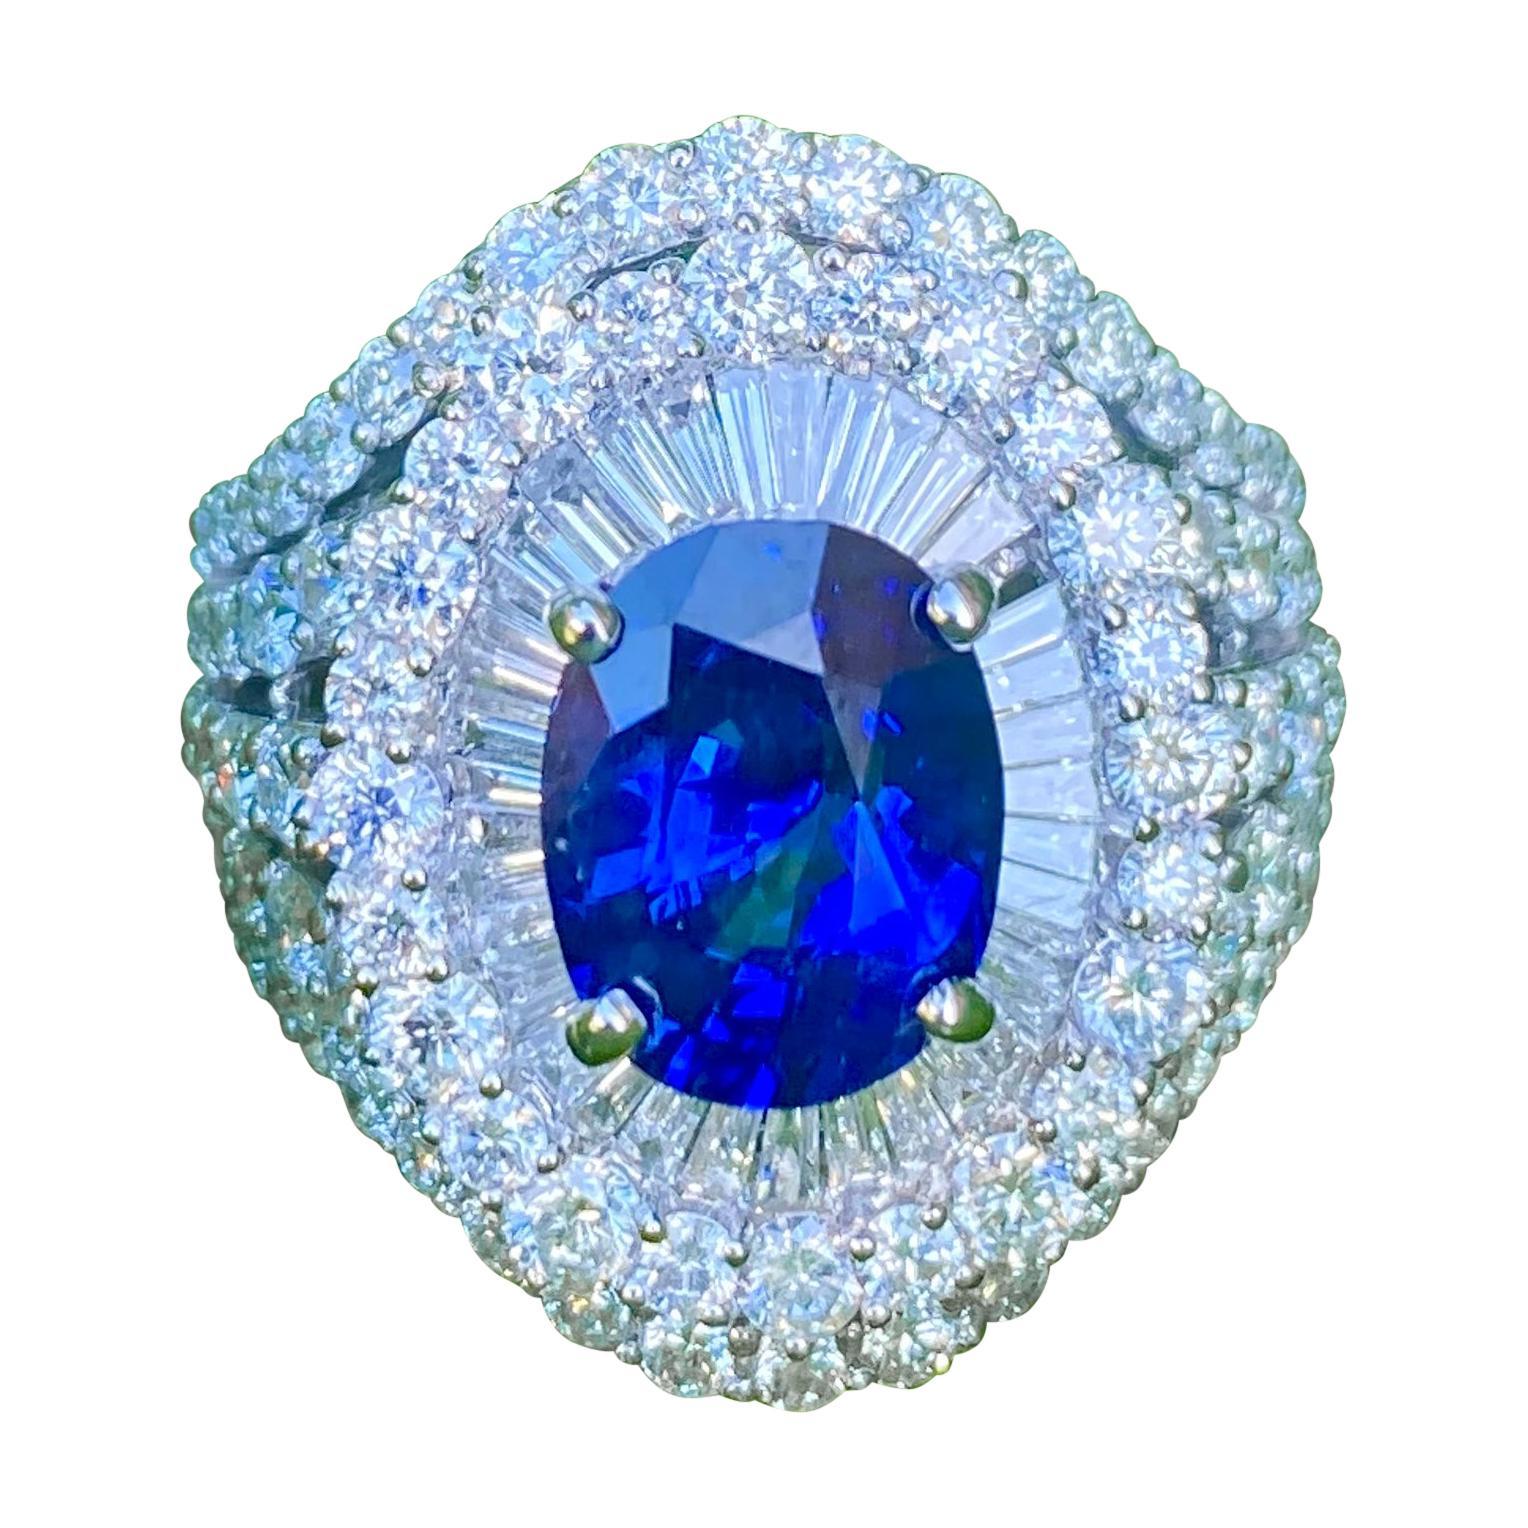 Large Oval Shaped Vivid Blue Sapphire and Diamond 7.20 Carat 18 Karat Gold Ring